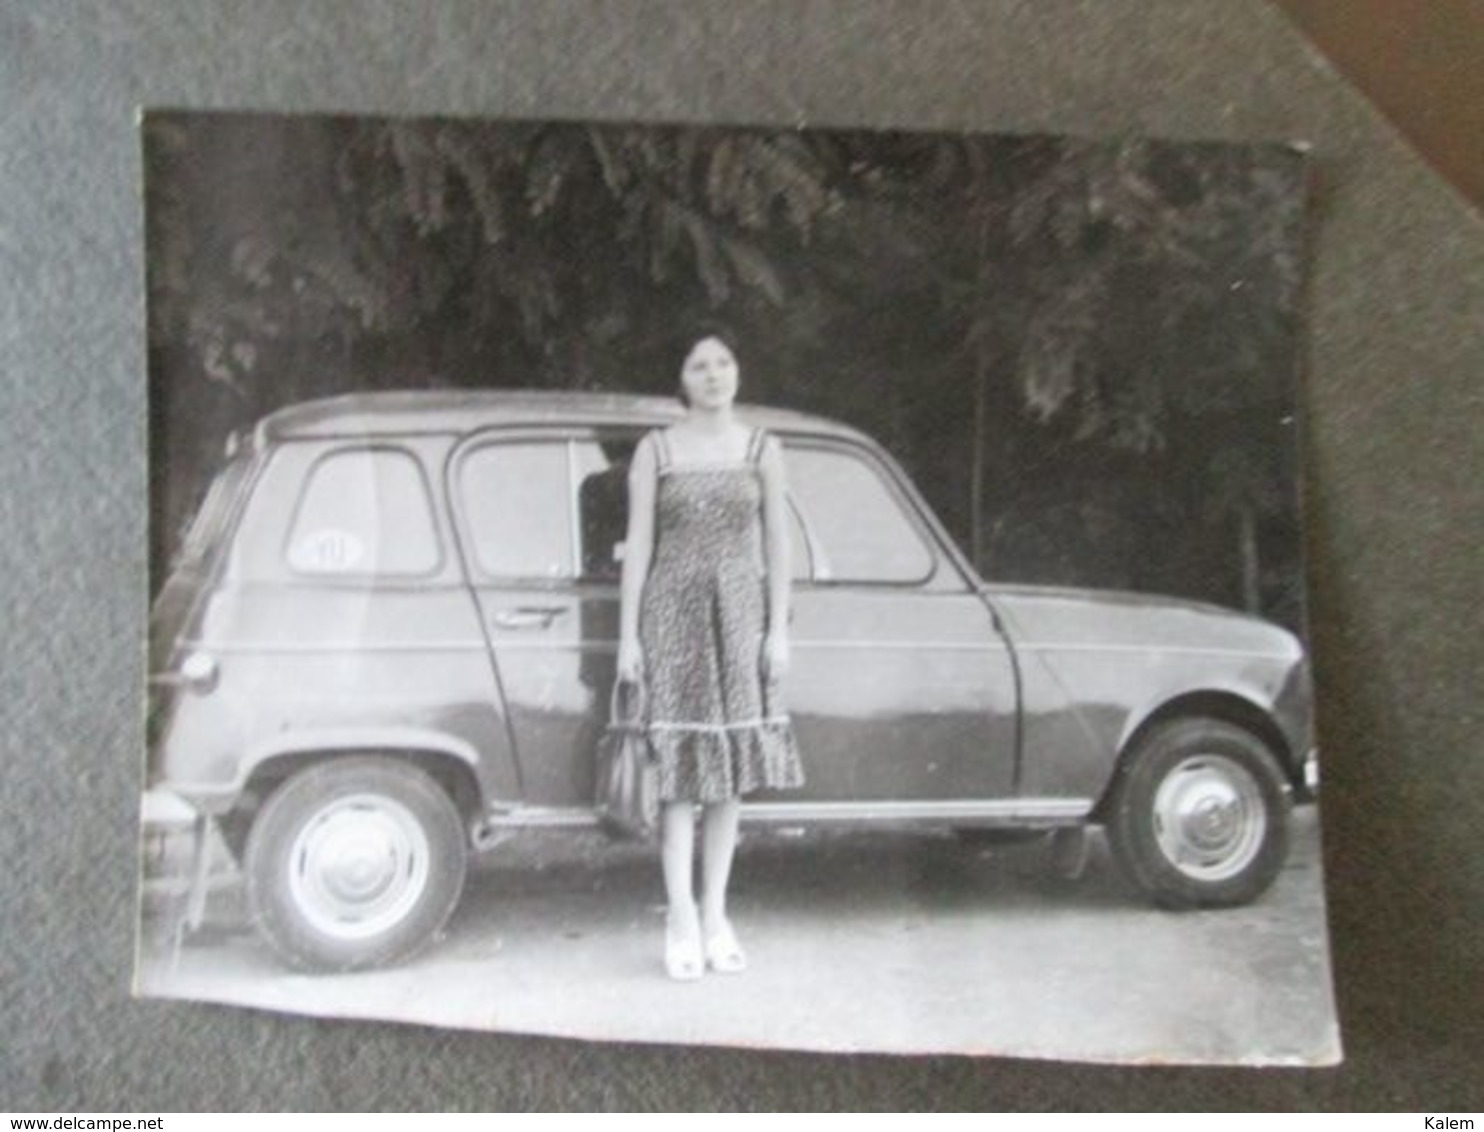 WOMAN WITH RENAULT CAR, FEMME AVEC VOITURE RENAULT, ORIGINAL PHOTO - Personnes Anonymes